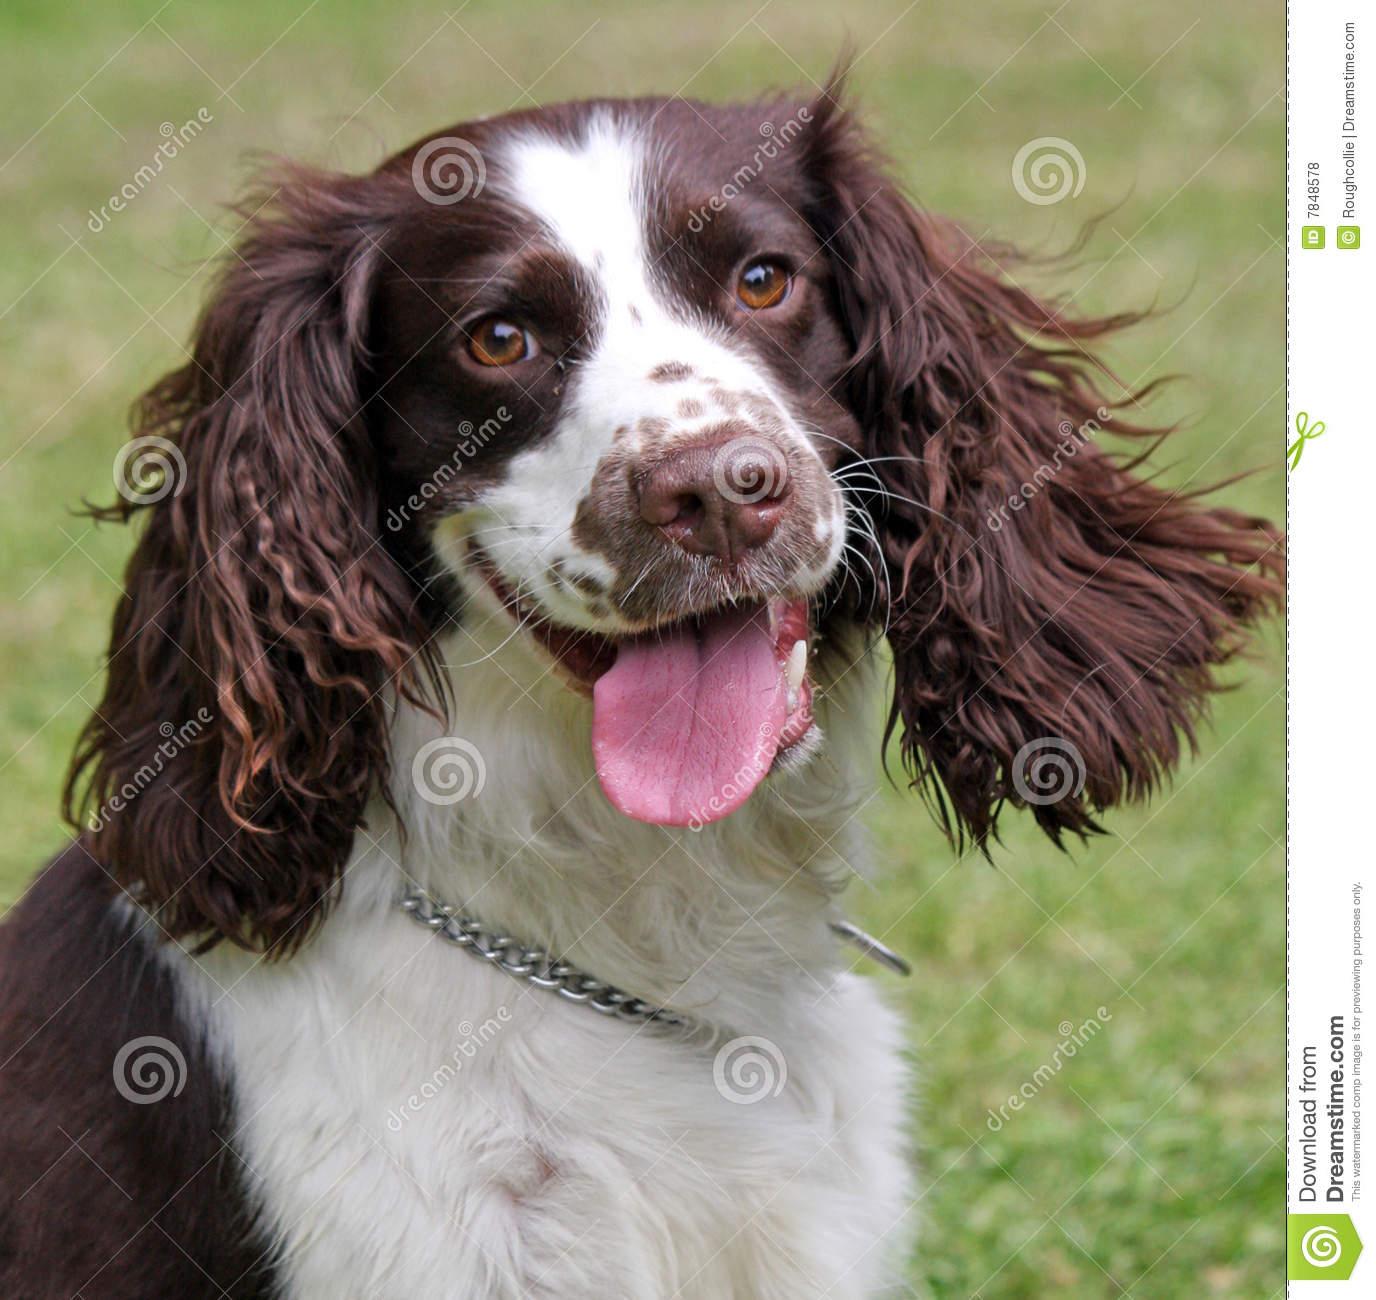 English Springer Spaniel Dog: English Royalty Free Stock S Happy Dog English Springer Spaniel Breed